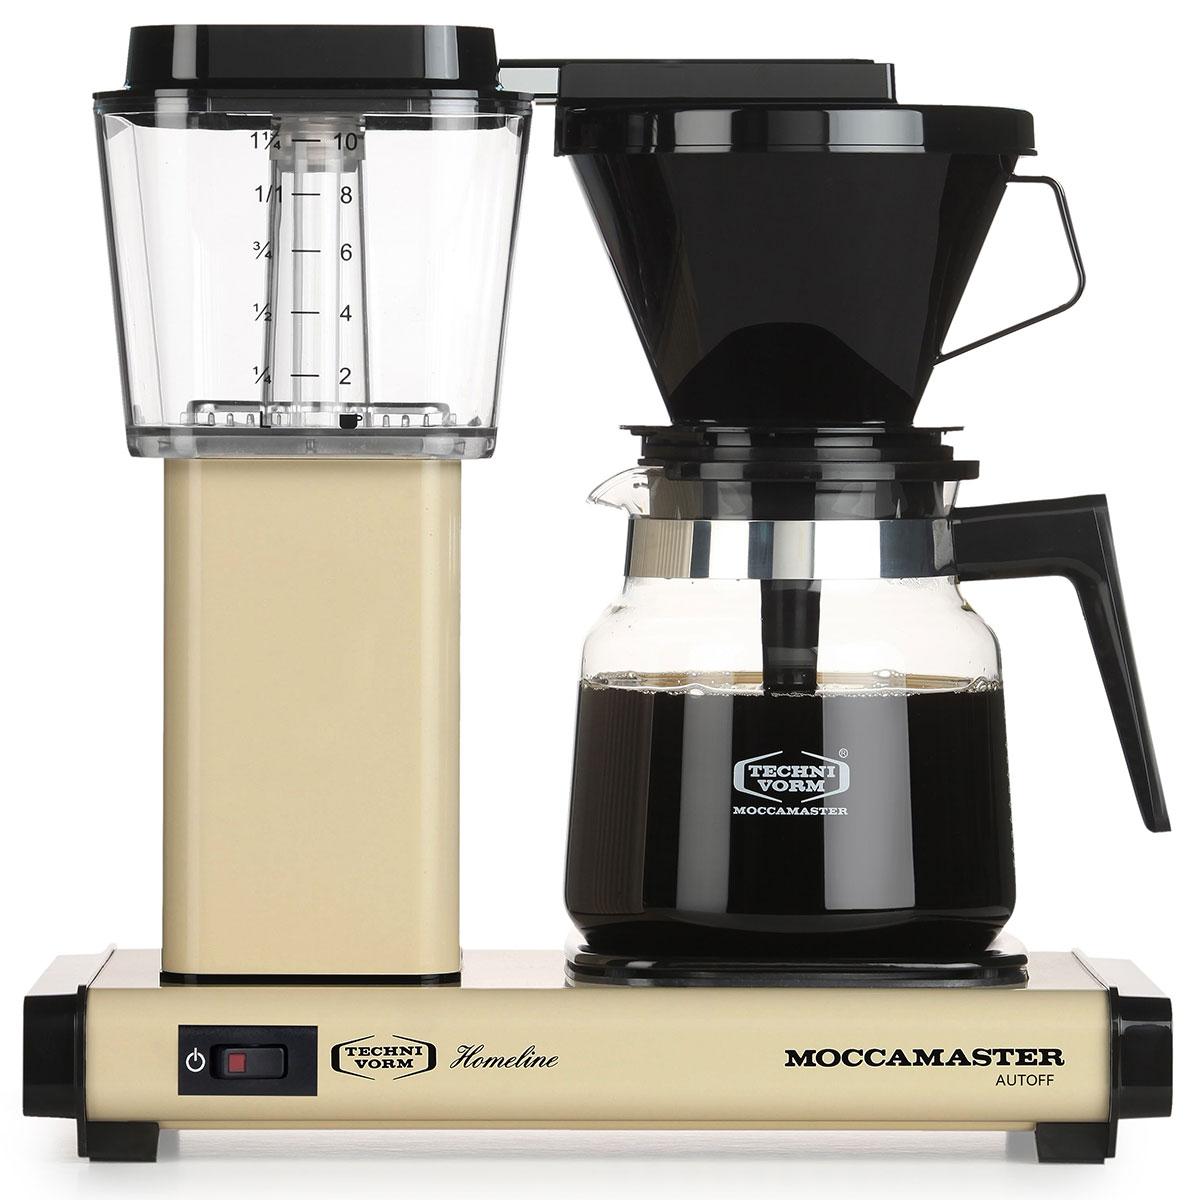 Moccamaster kaffemaskine - H931 AO Homeline - Light Ivory